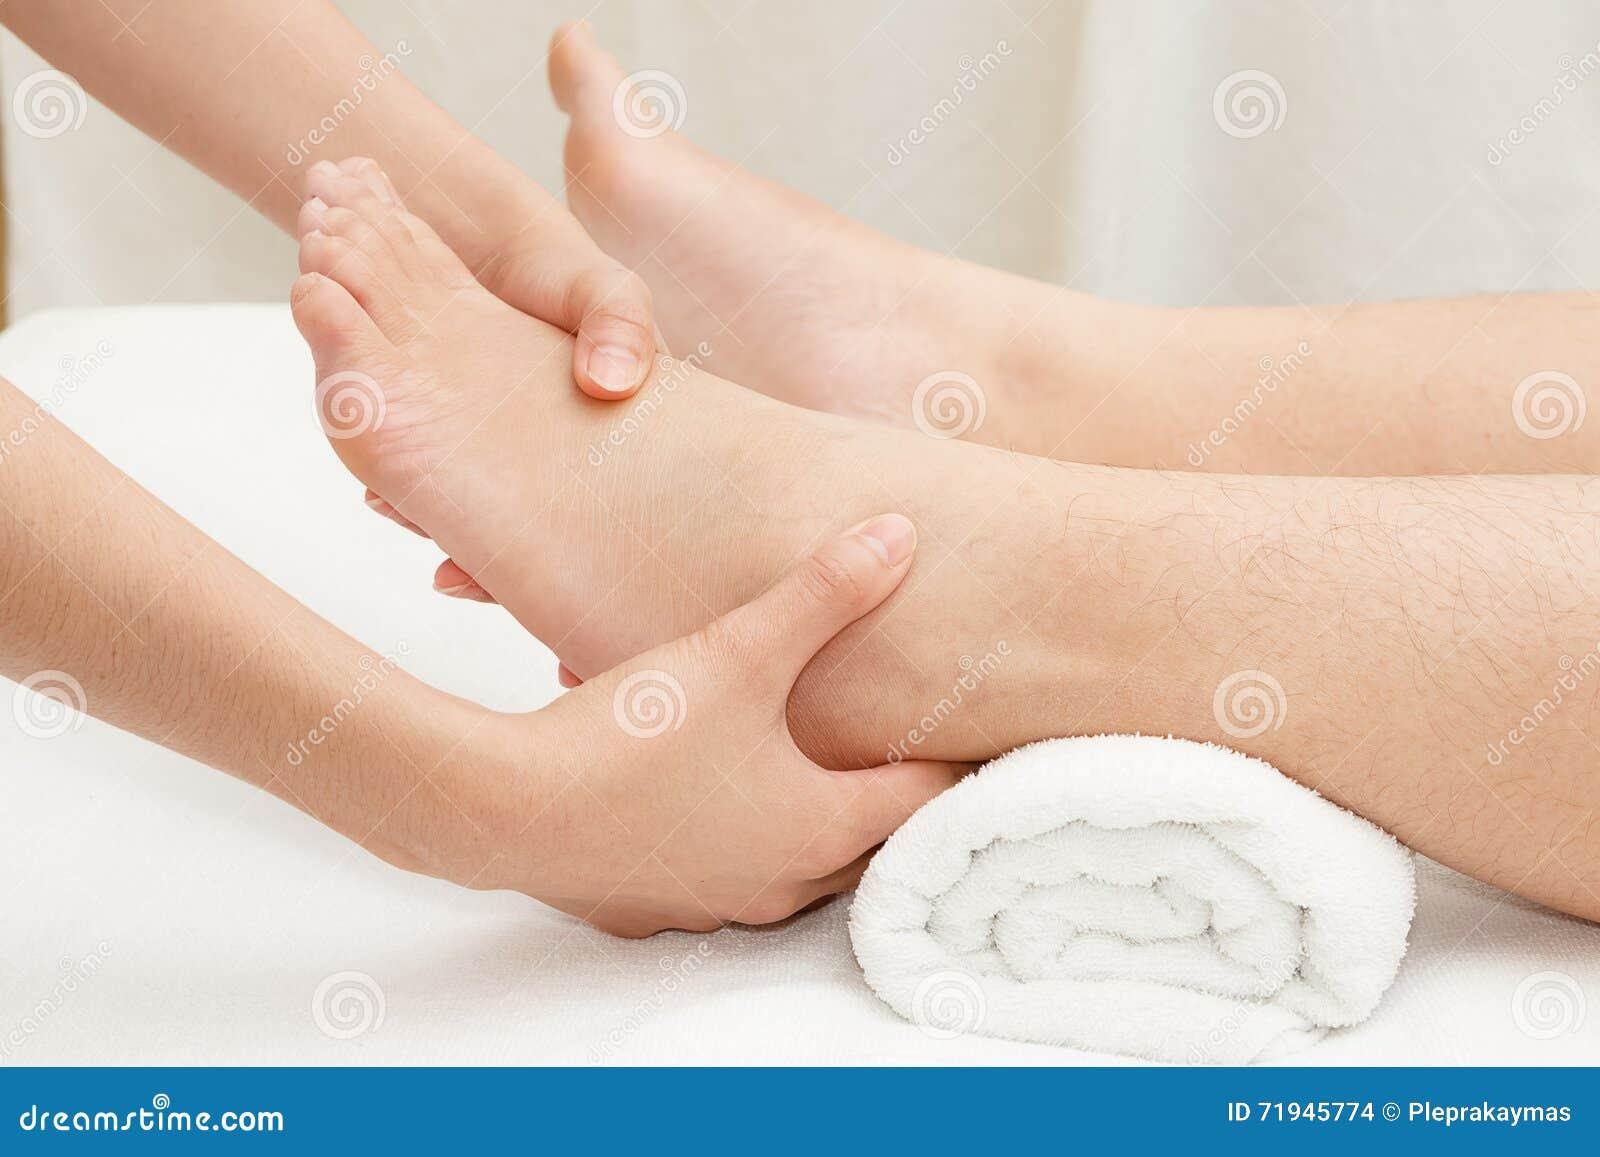 Руки терапевта массажируя женскую ногу